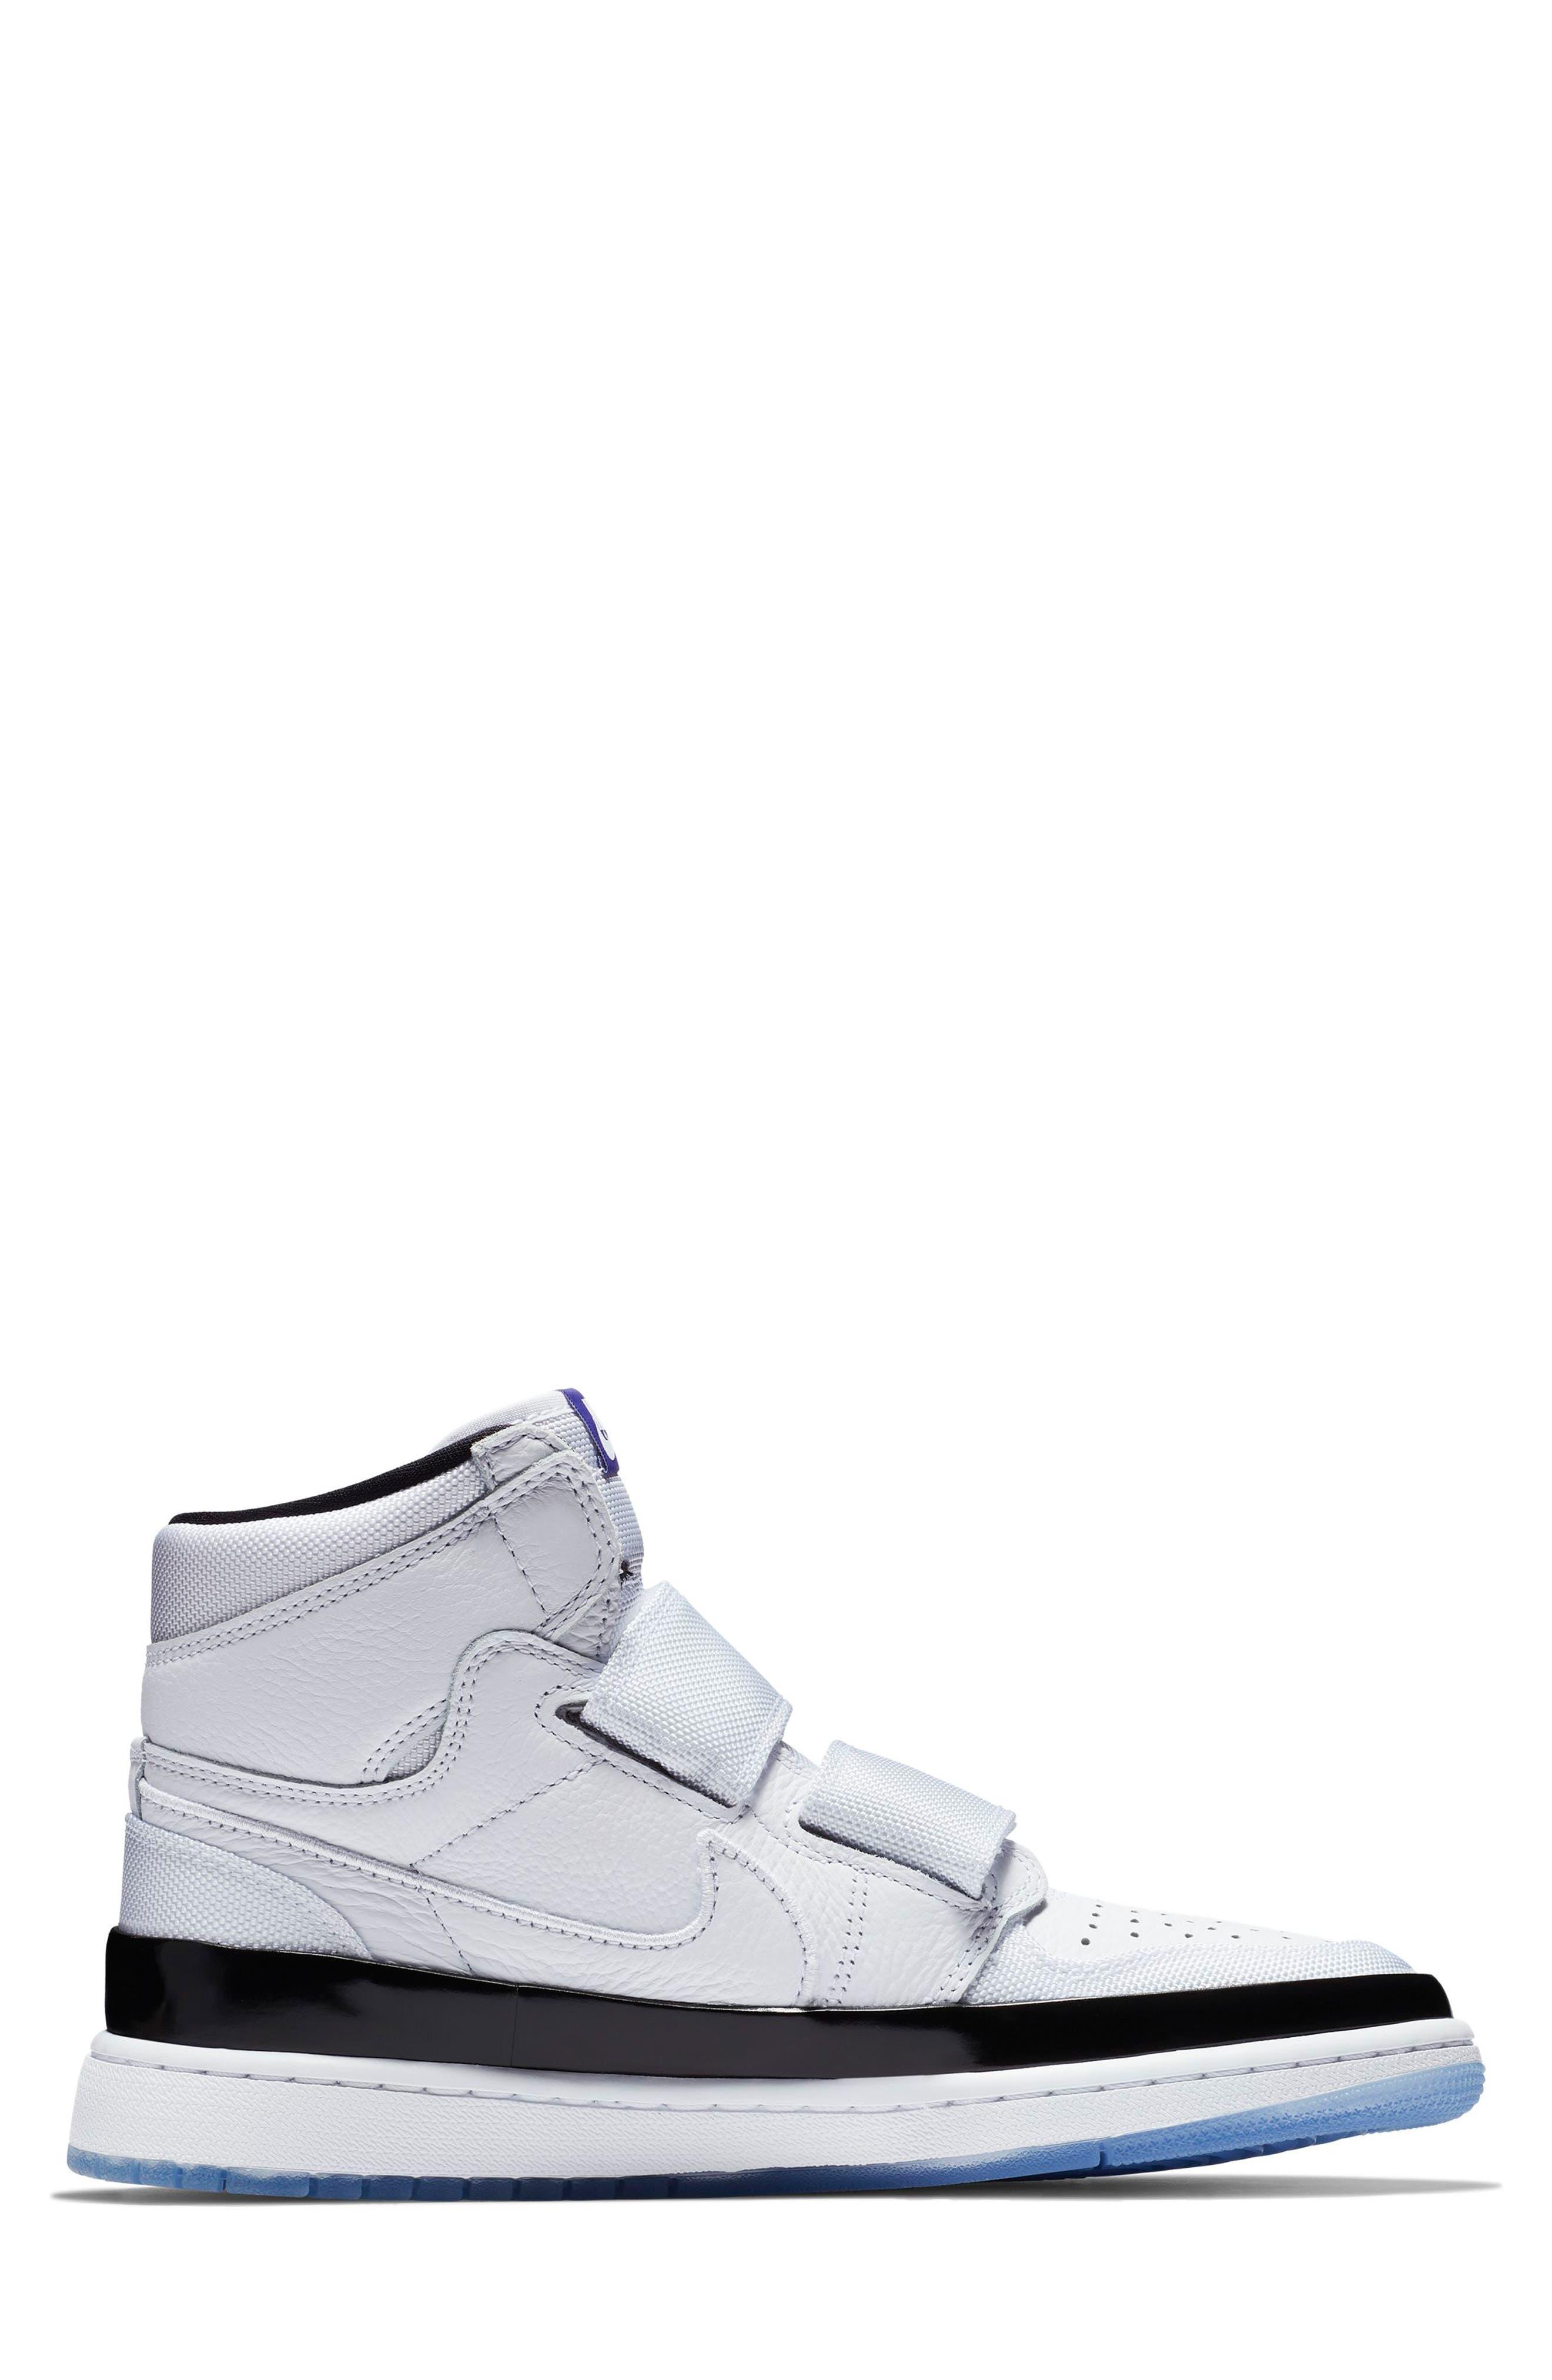 NIKE, Air Jordan 1 Retro High Double Strap Sneaker, Alternate thumbnail 2, color, WHITE/ DARK CONCORD/ BLACK